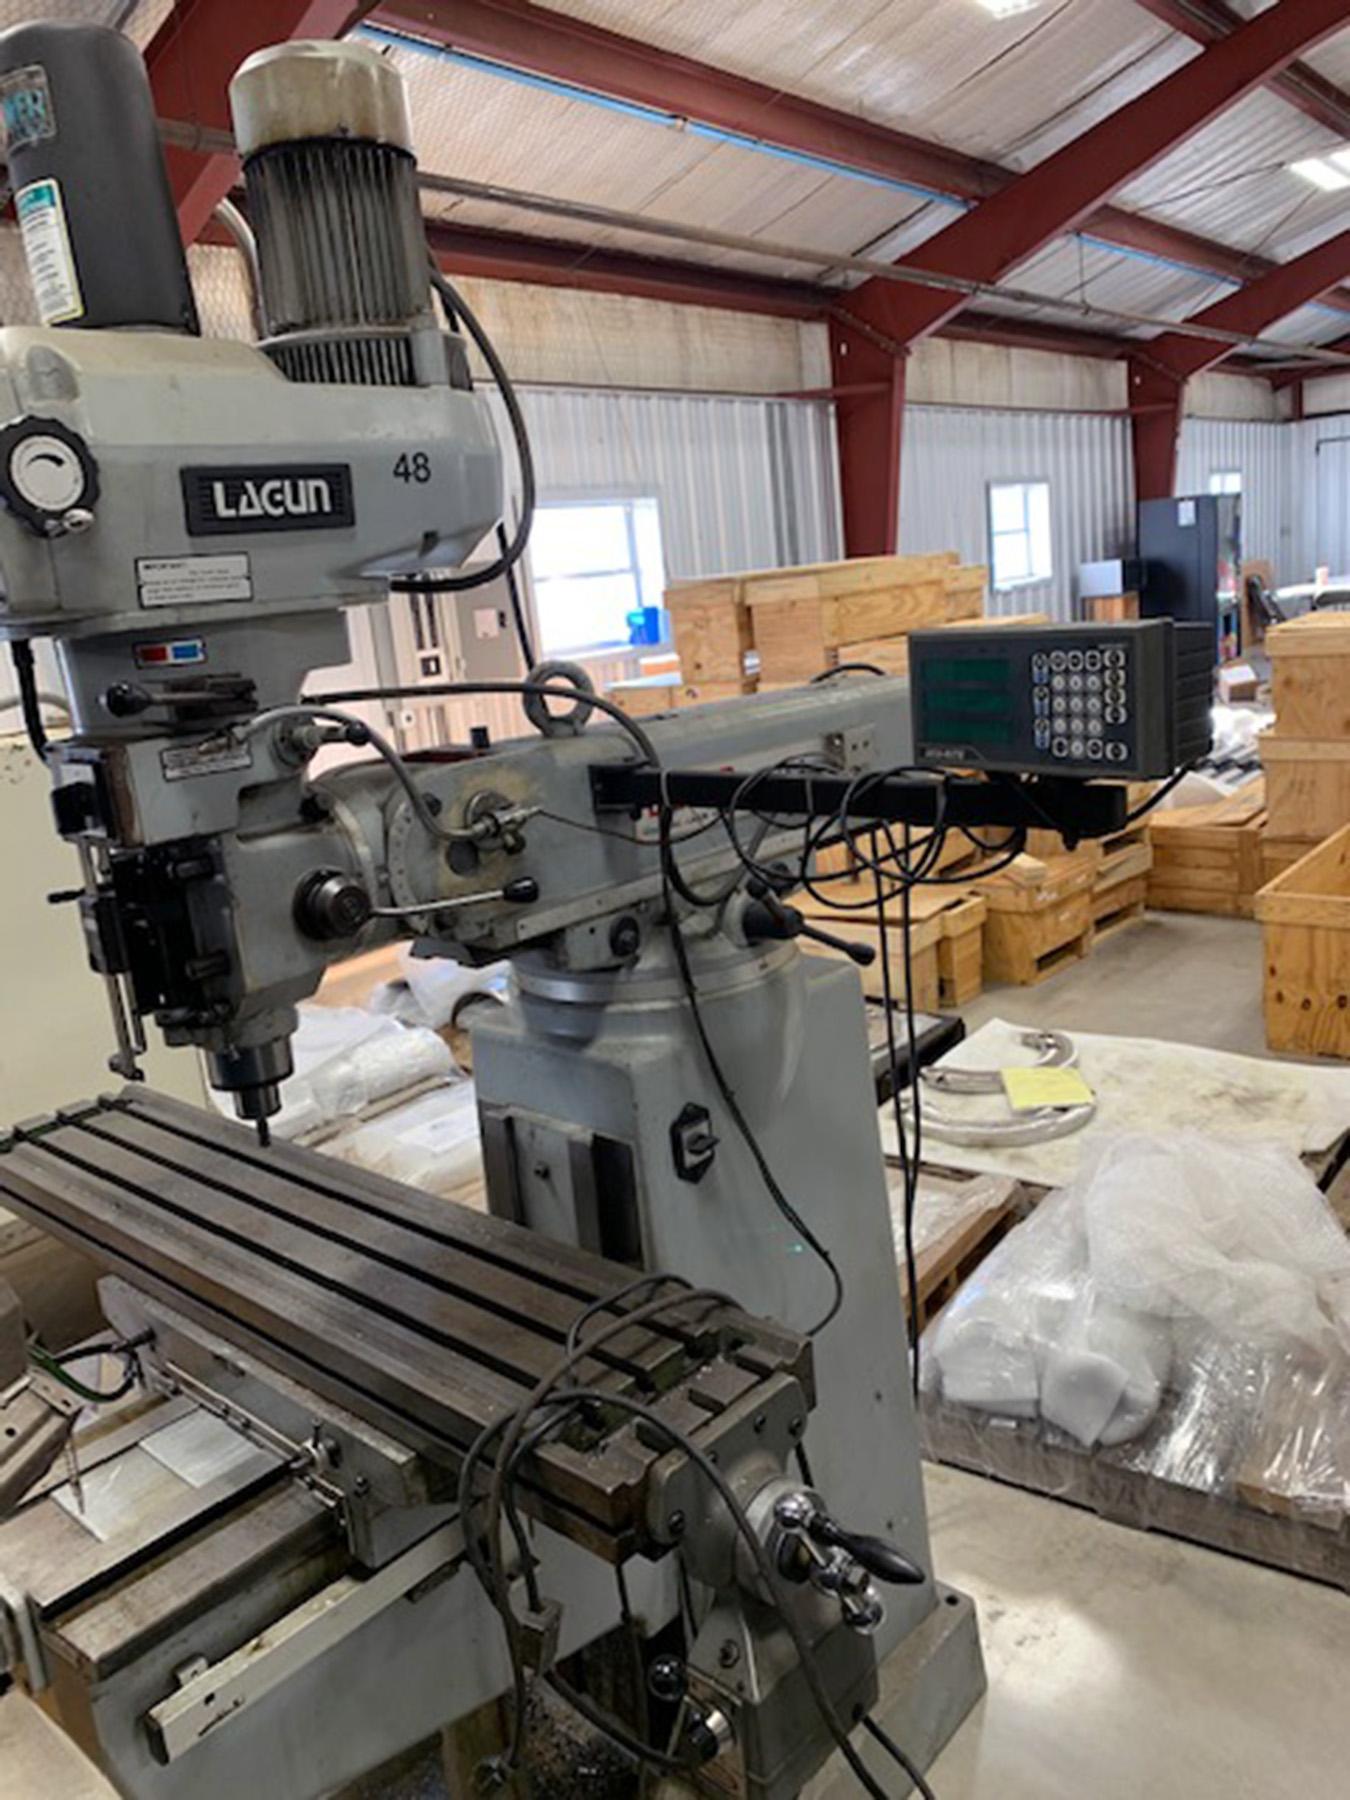 USED, LAGUN MODEL FTV-2 VERTICAL MILLING MACHINE